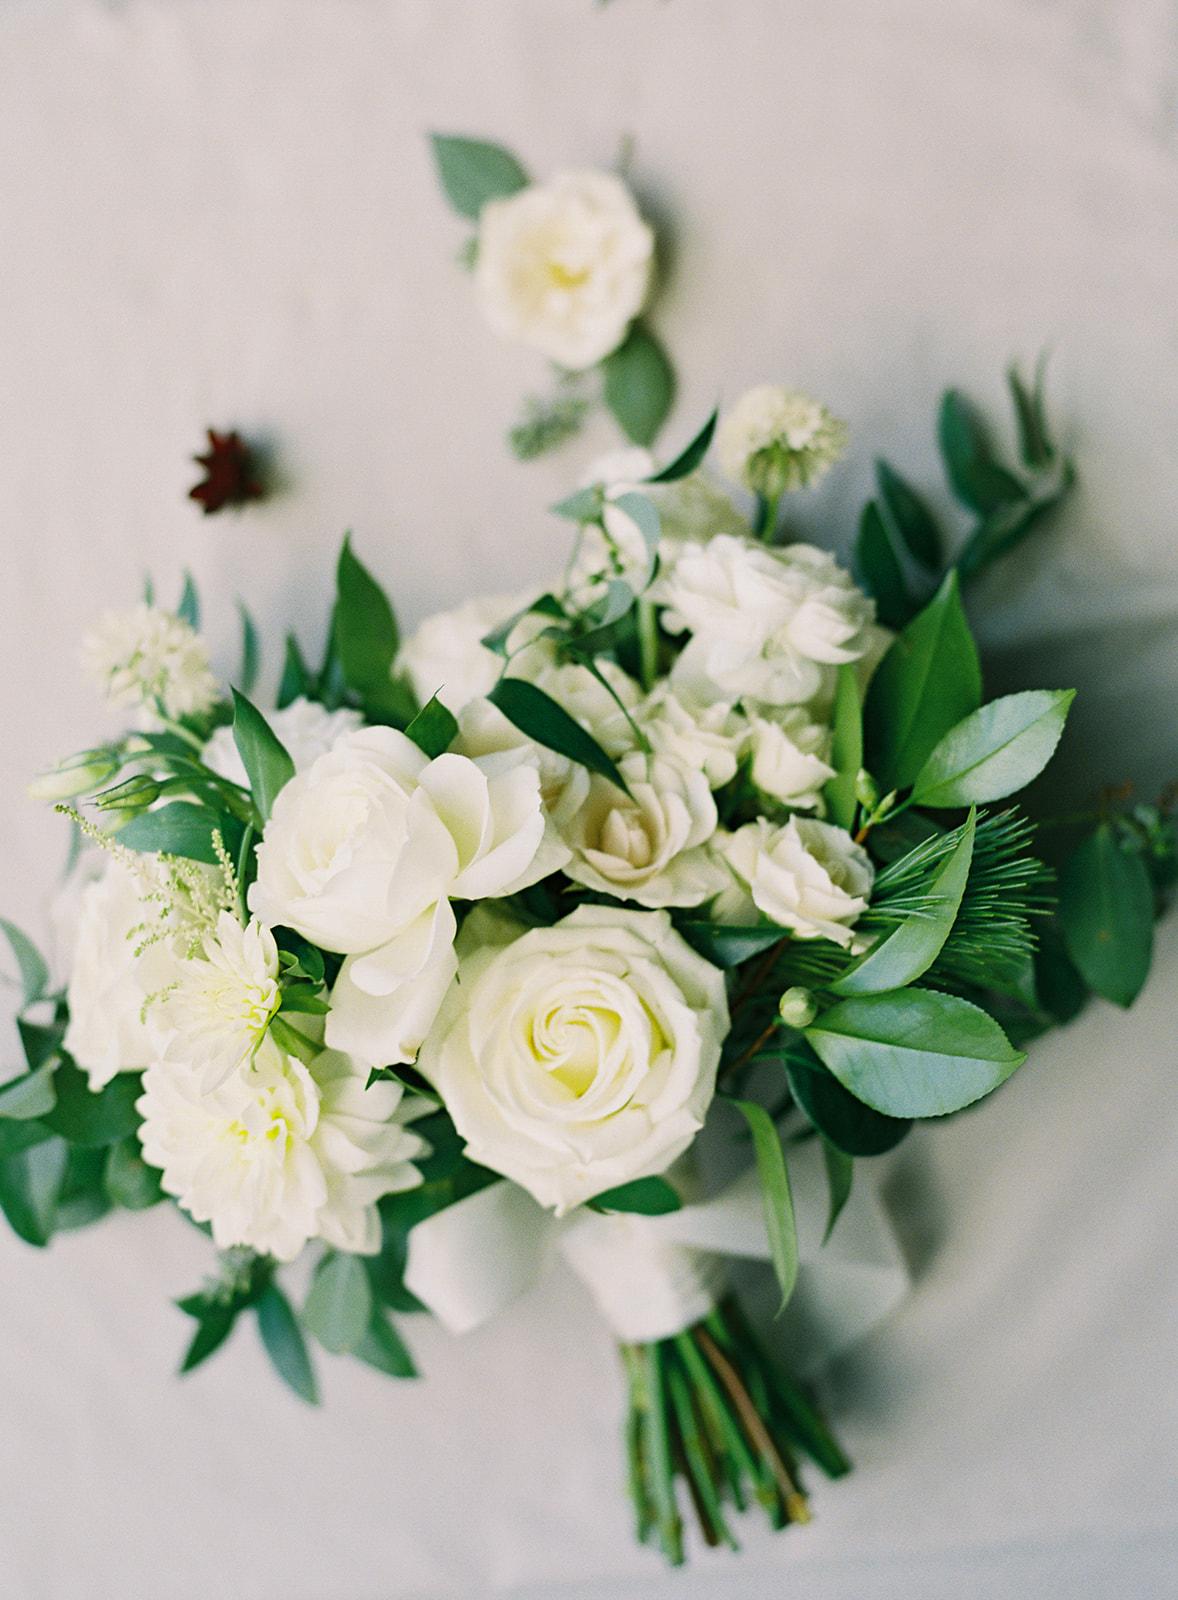 Sarah and John Wedding Day-Carrie King Photographer-1.jpg